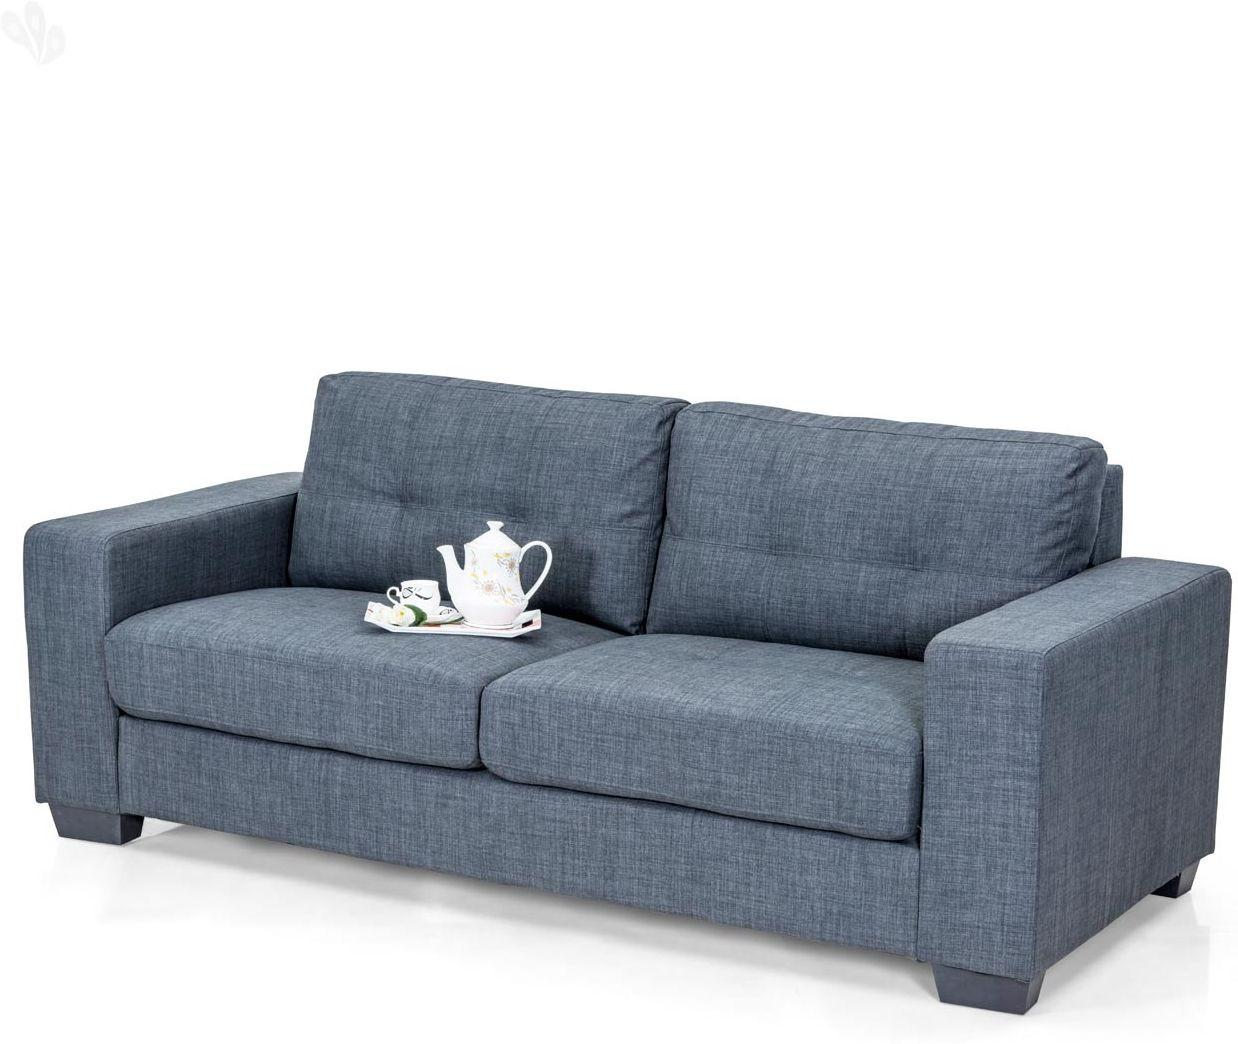 sofa foam cushions price india donate london royal oak fabric 3 seater grey furniture in